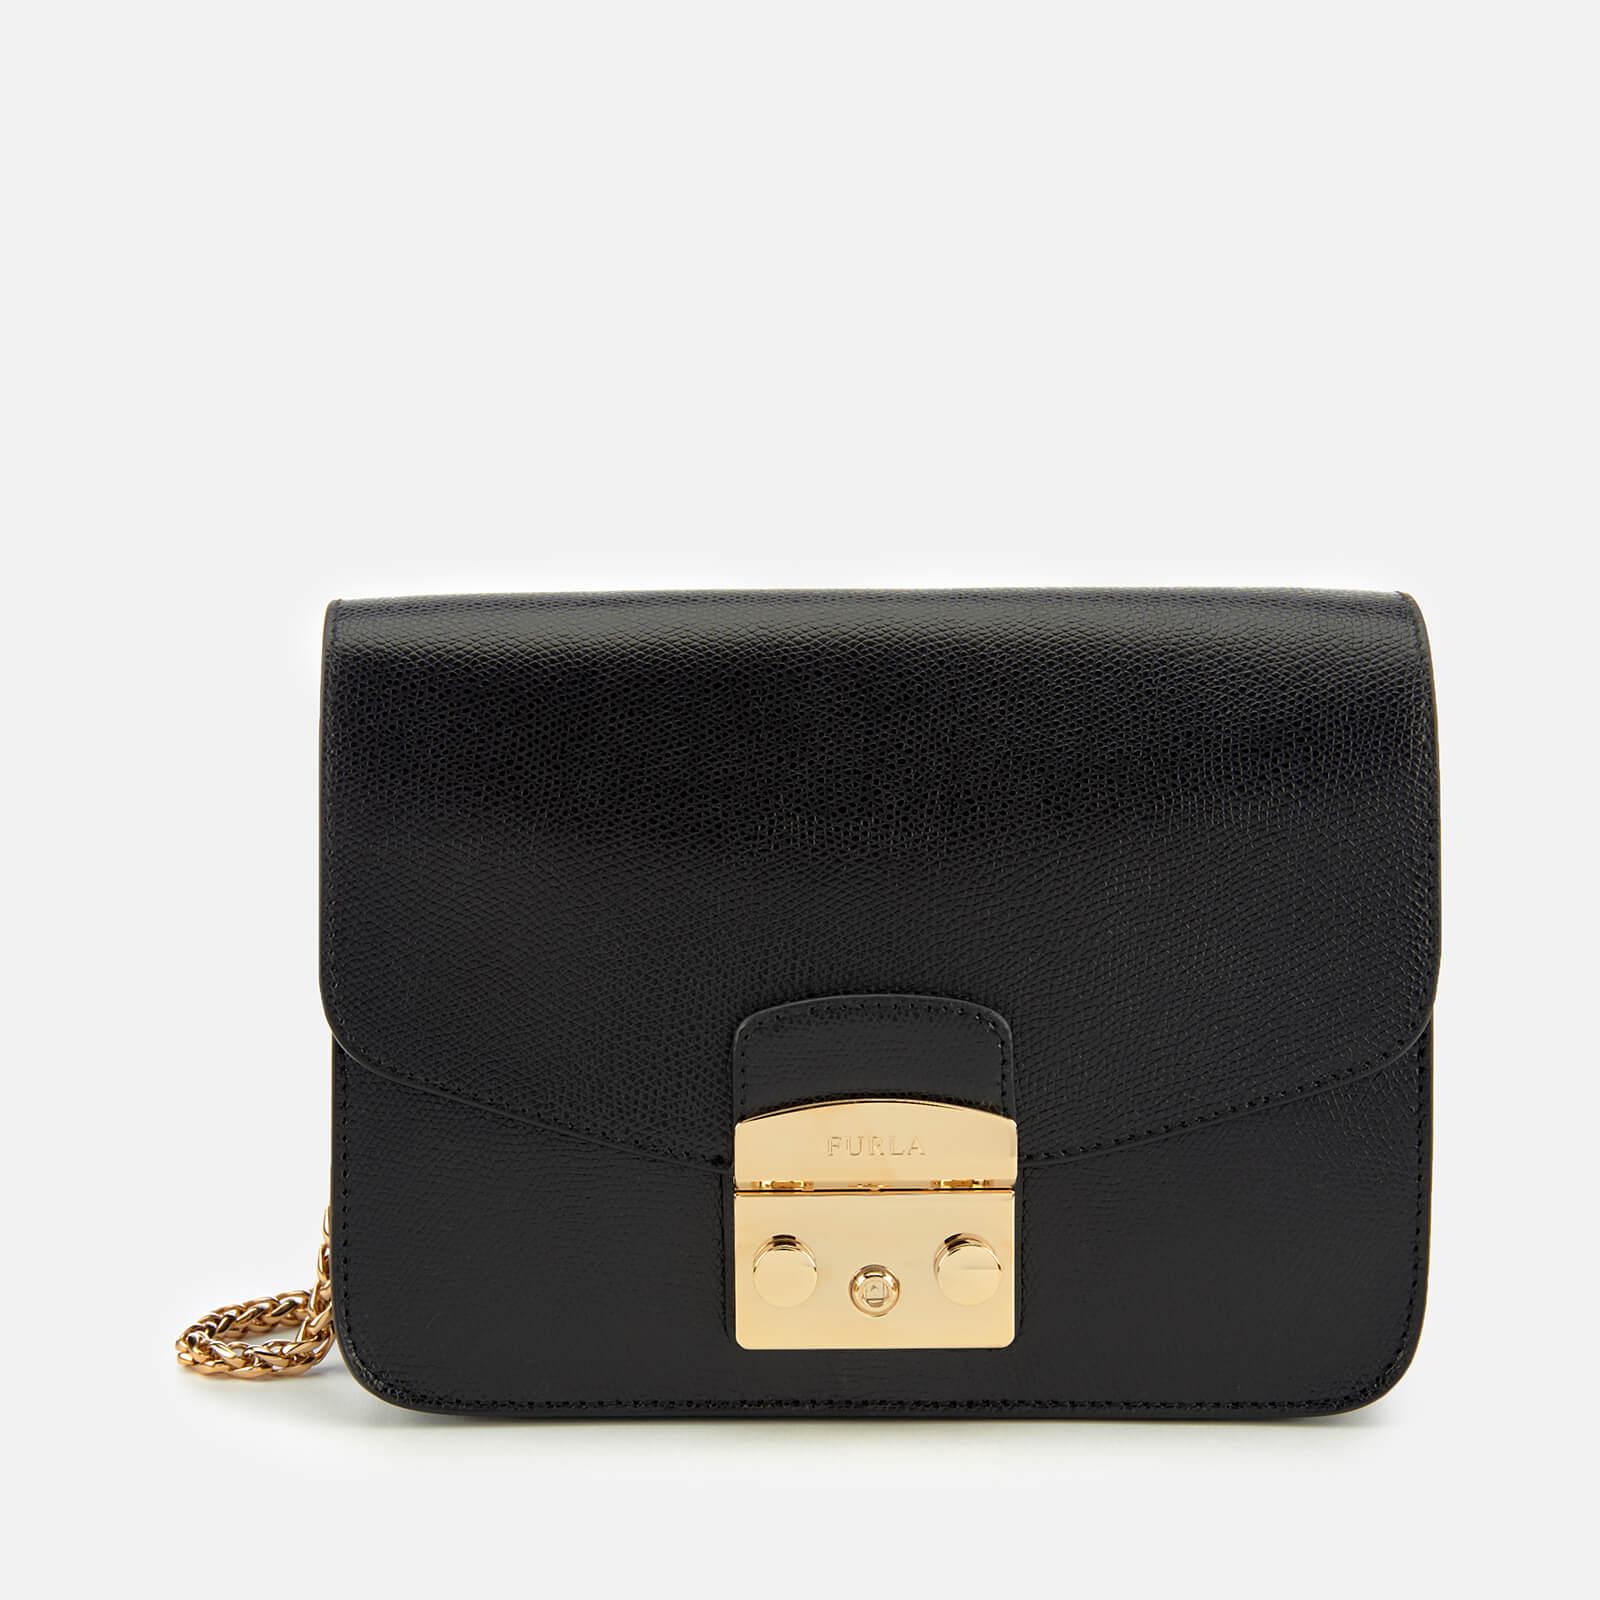 Furla Women's Metropolis Small Cross Body Bag - Black